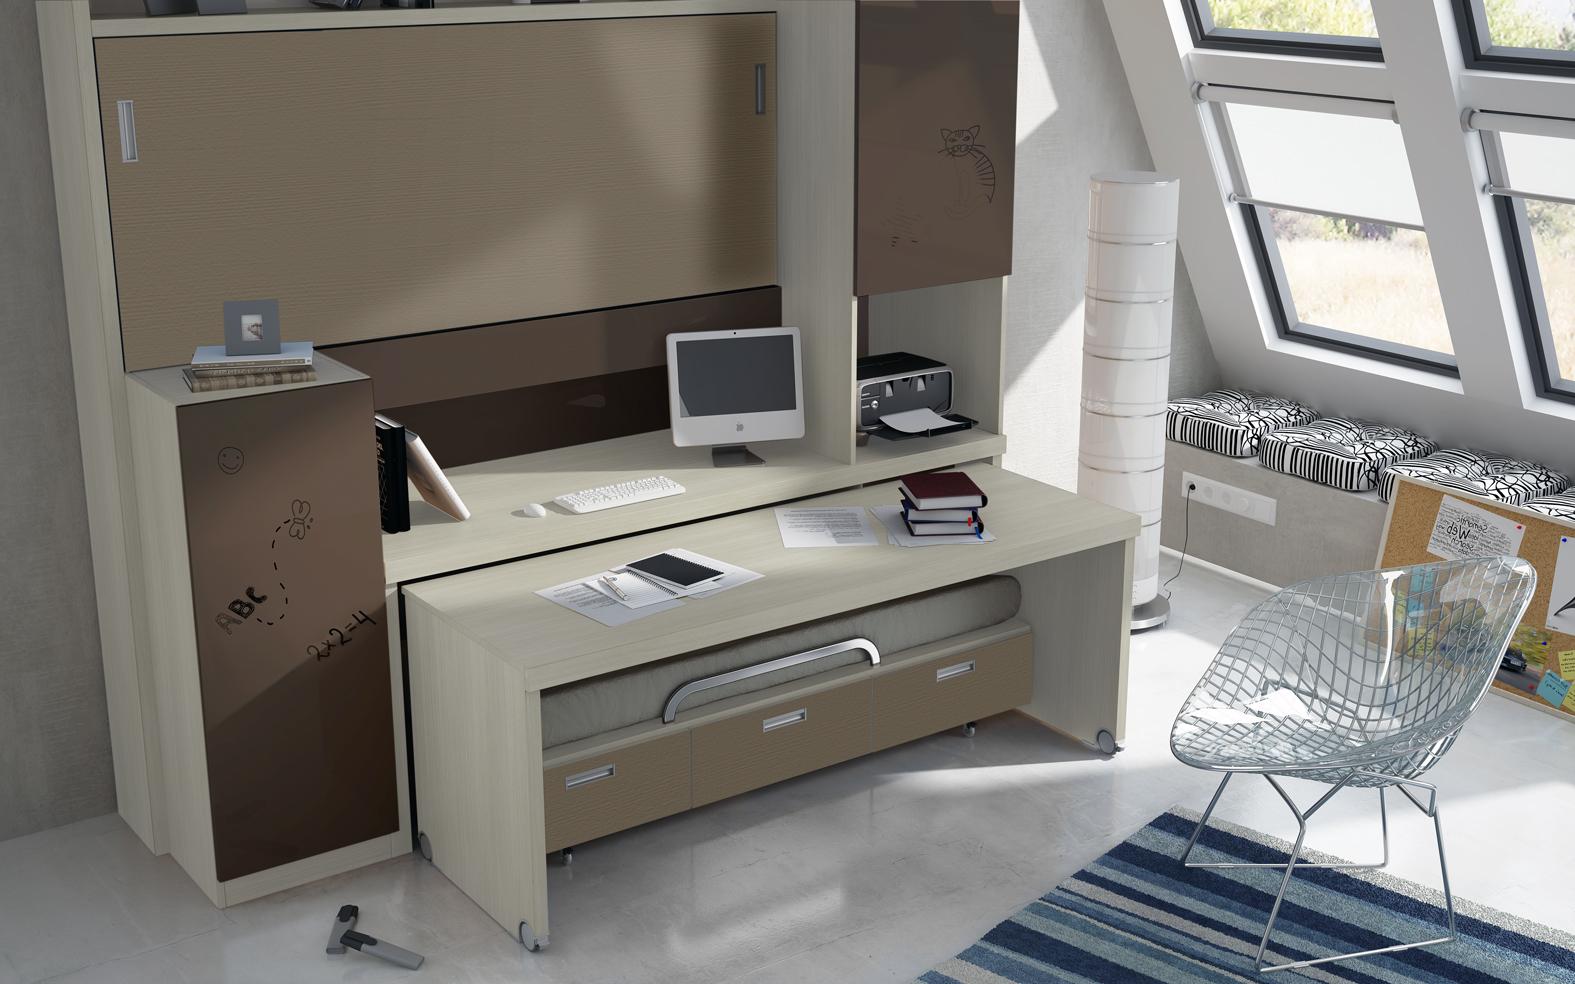 Camas abatibles autoportantes for Cama compacta con escritorio